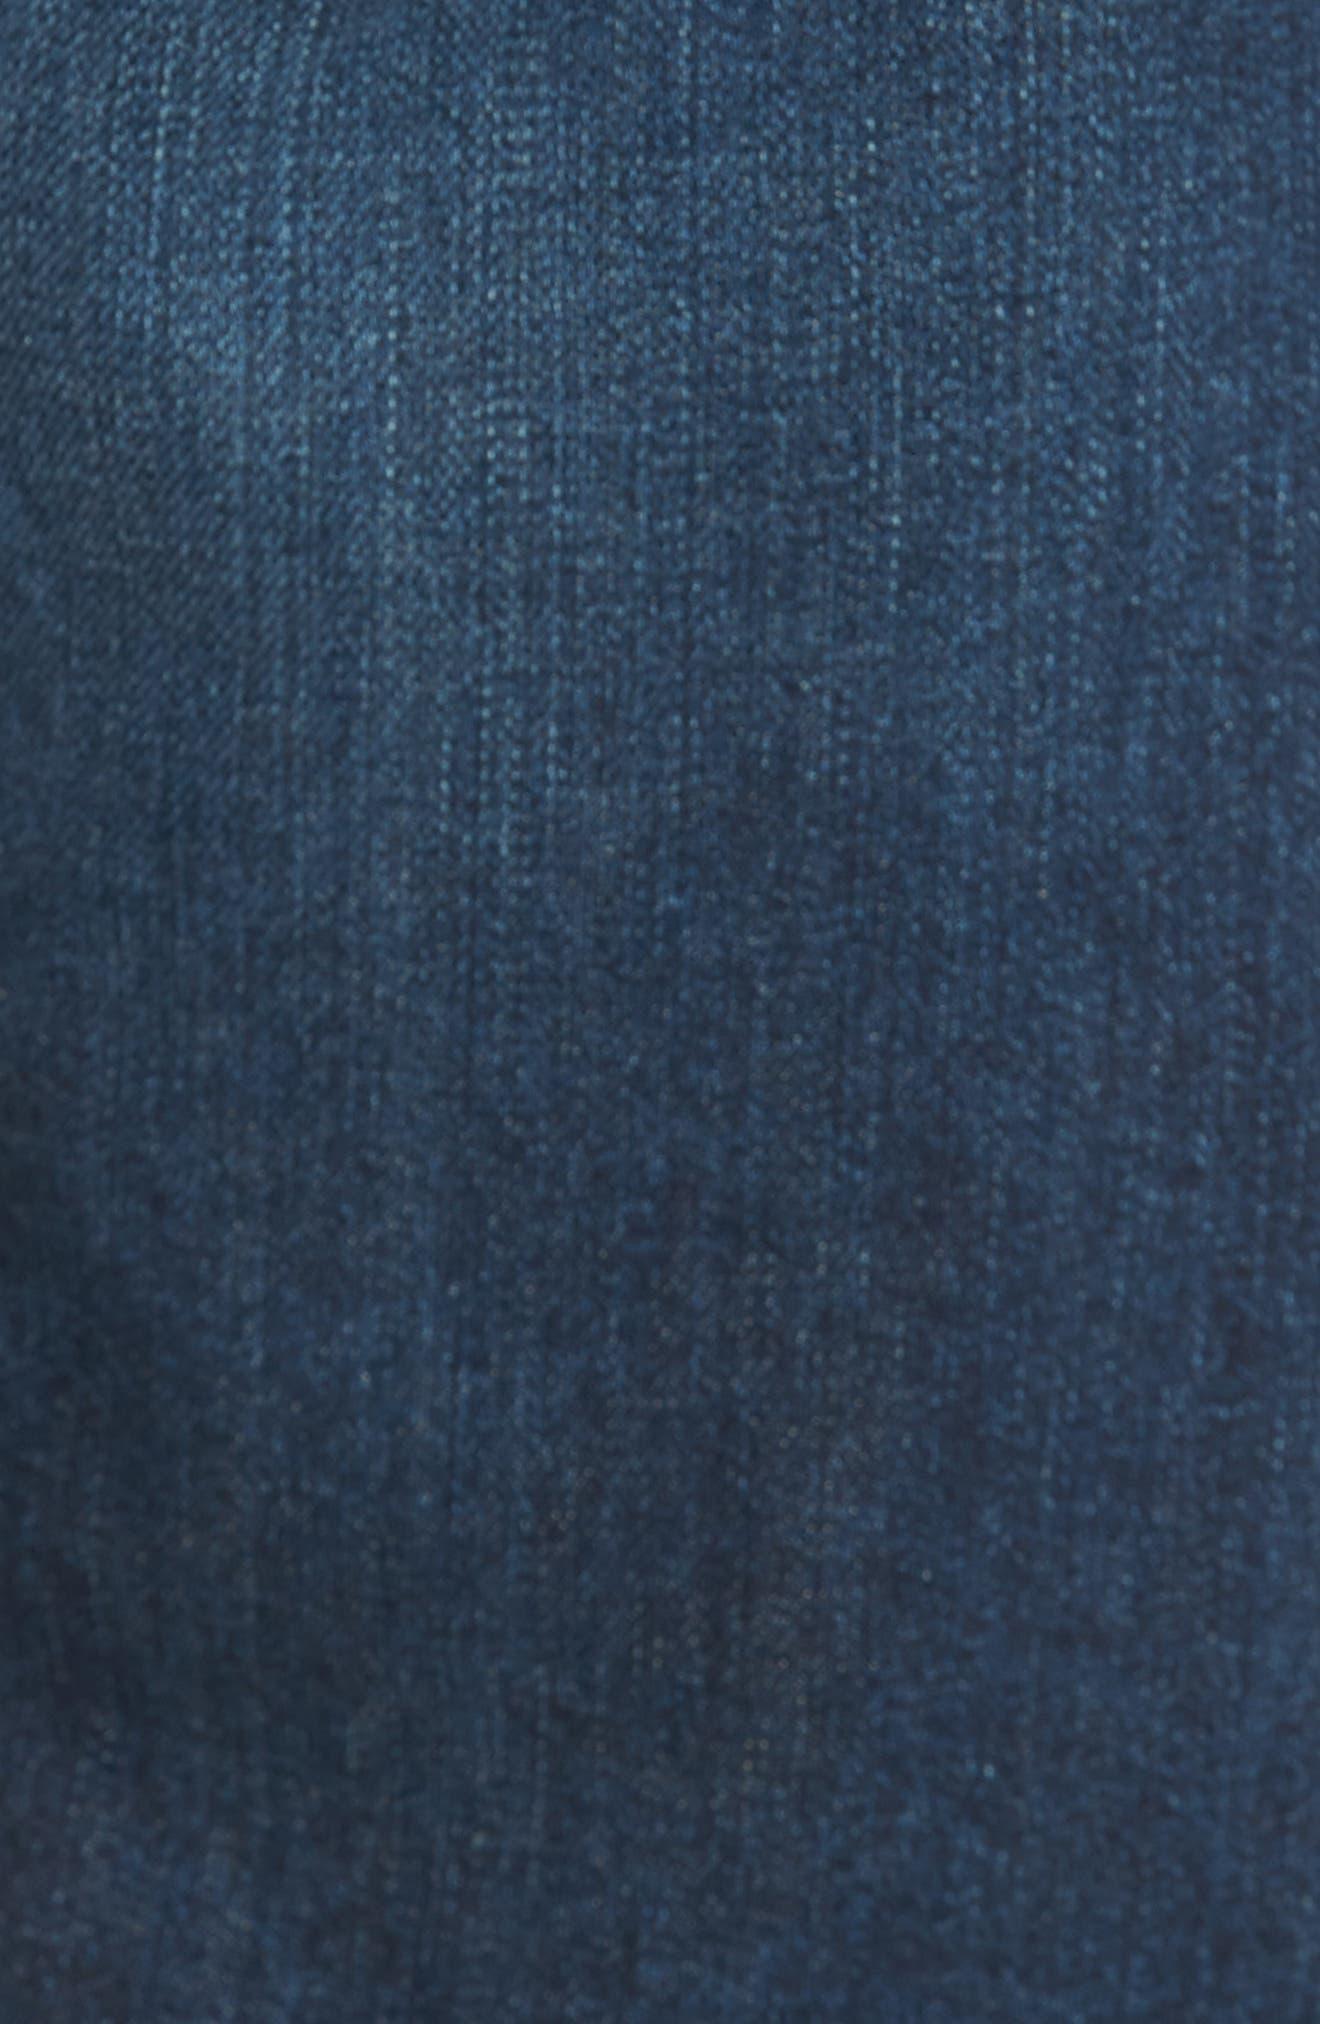 Blake Slim Fit Jeans,                             Alternate thumbnail 5, color,                             Regret